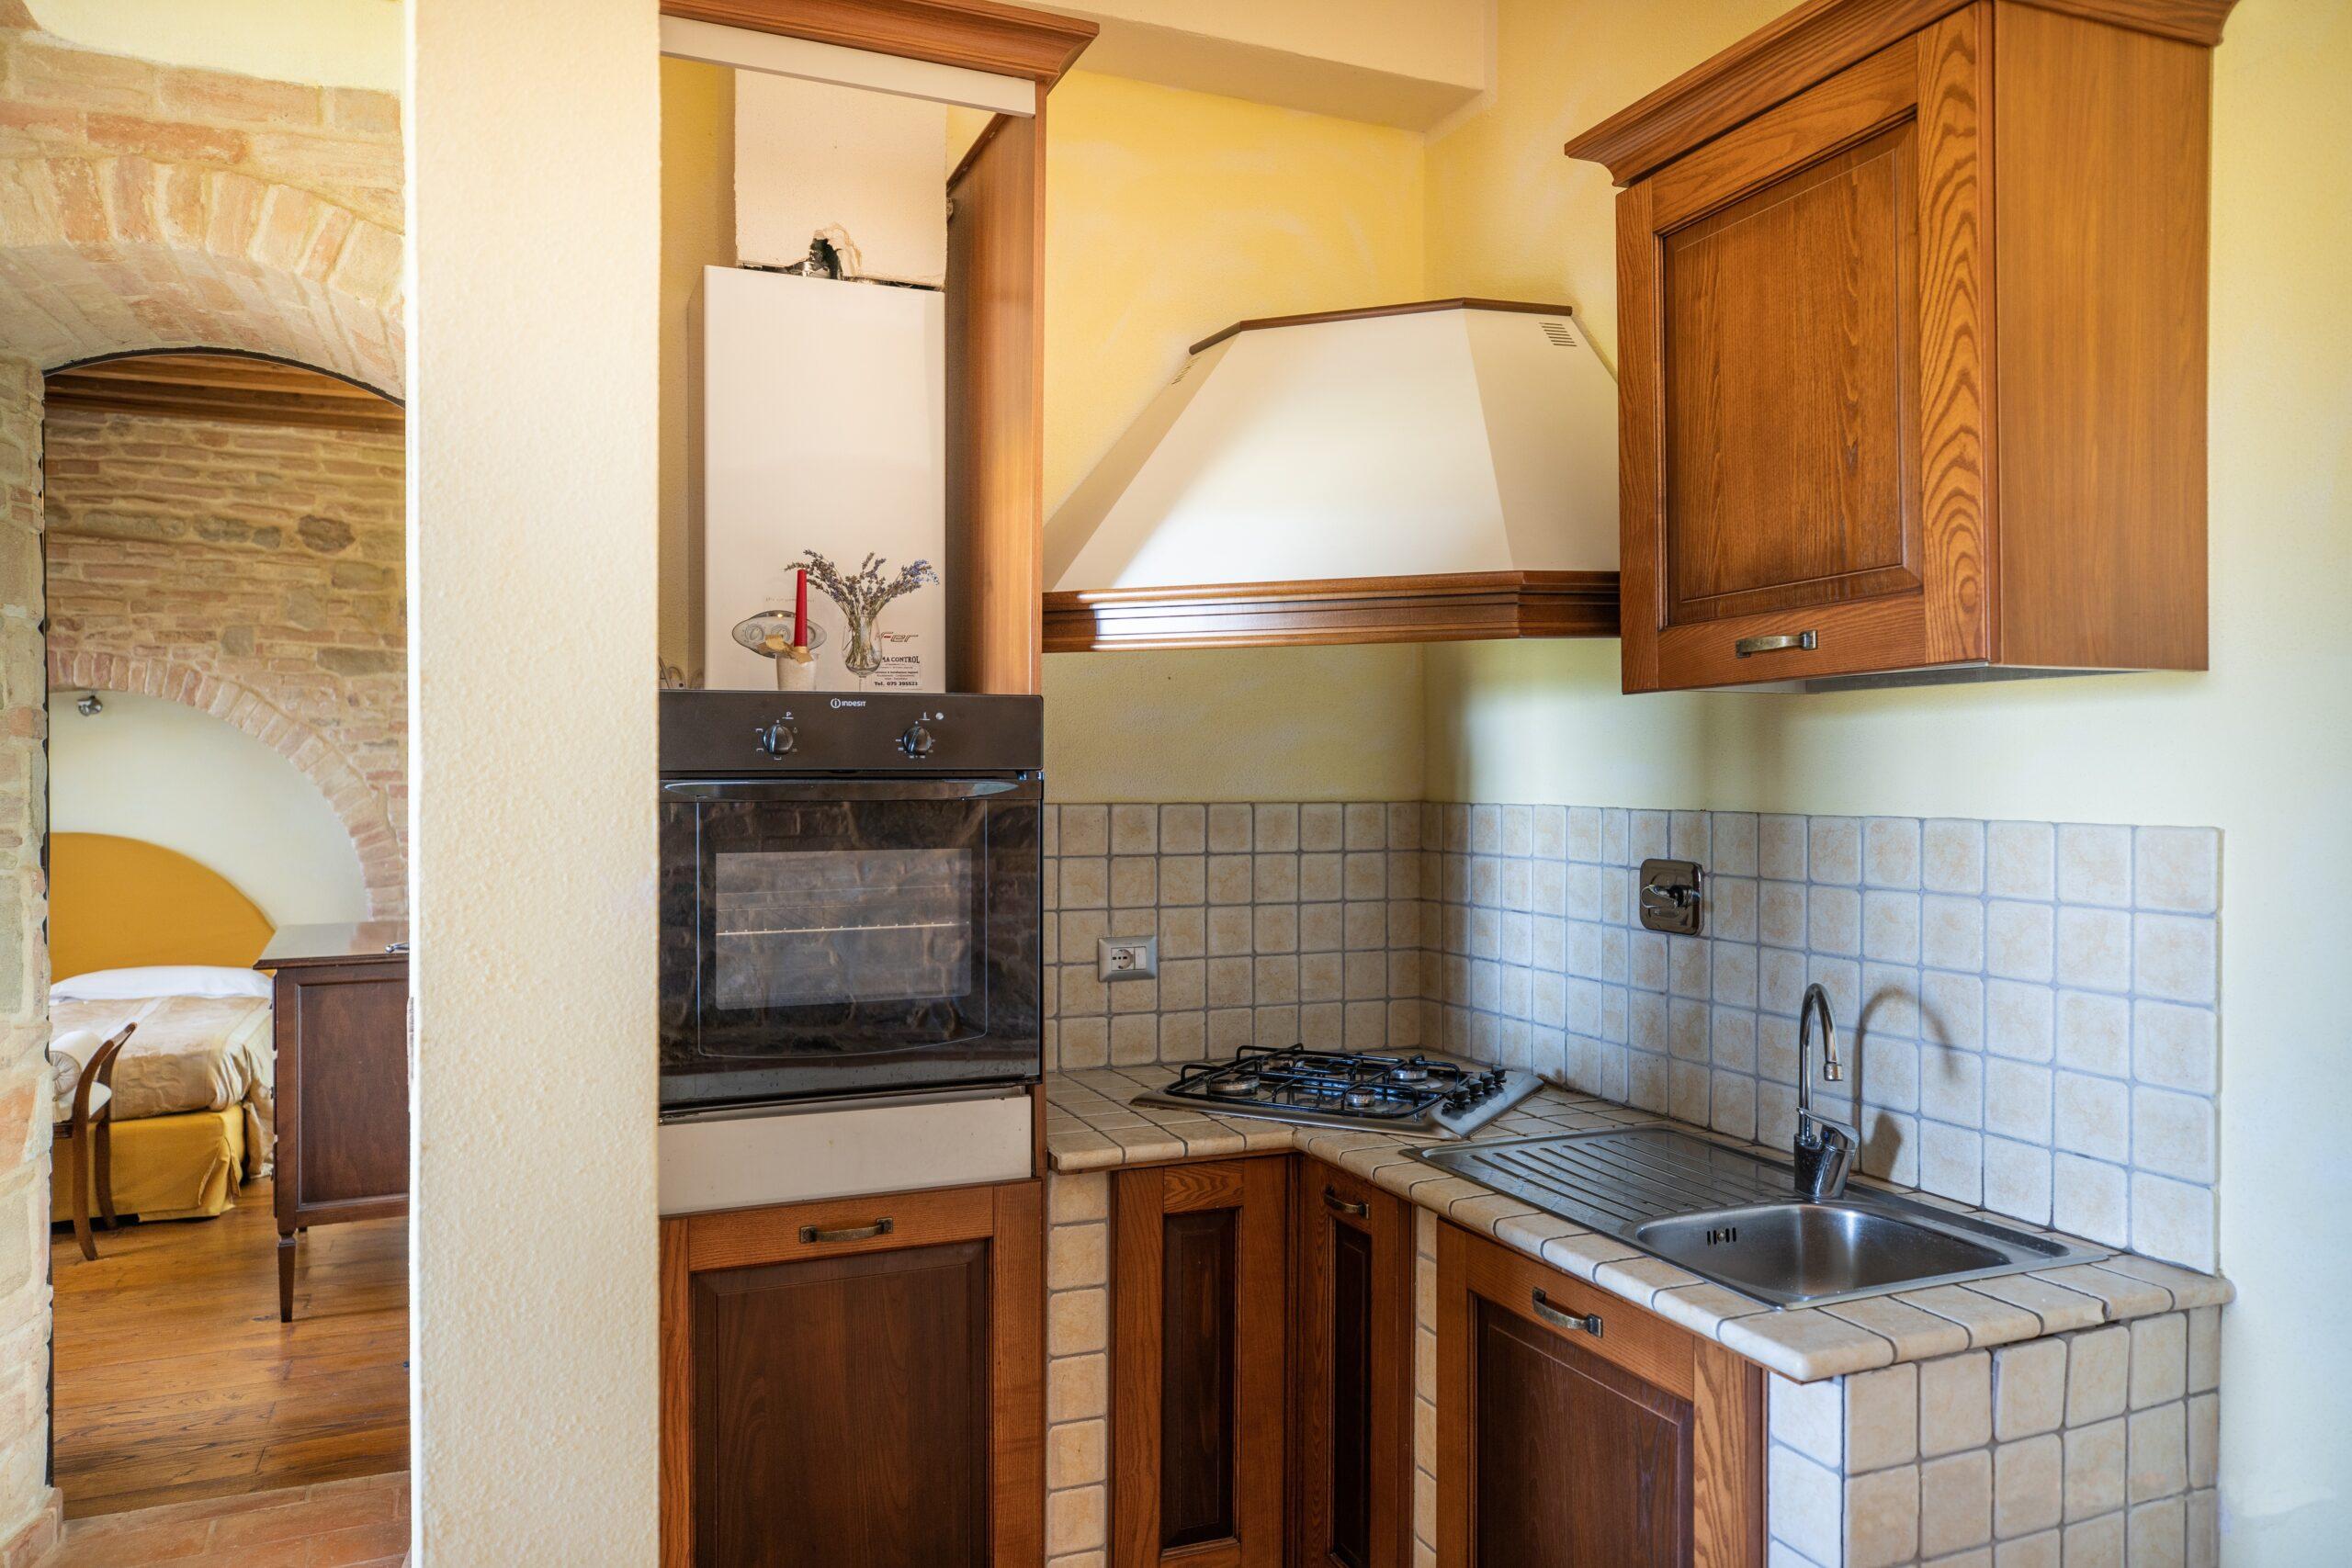 Appartamento con cucina e forno